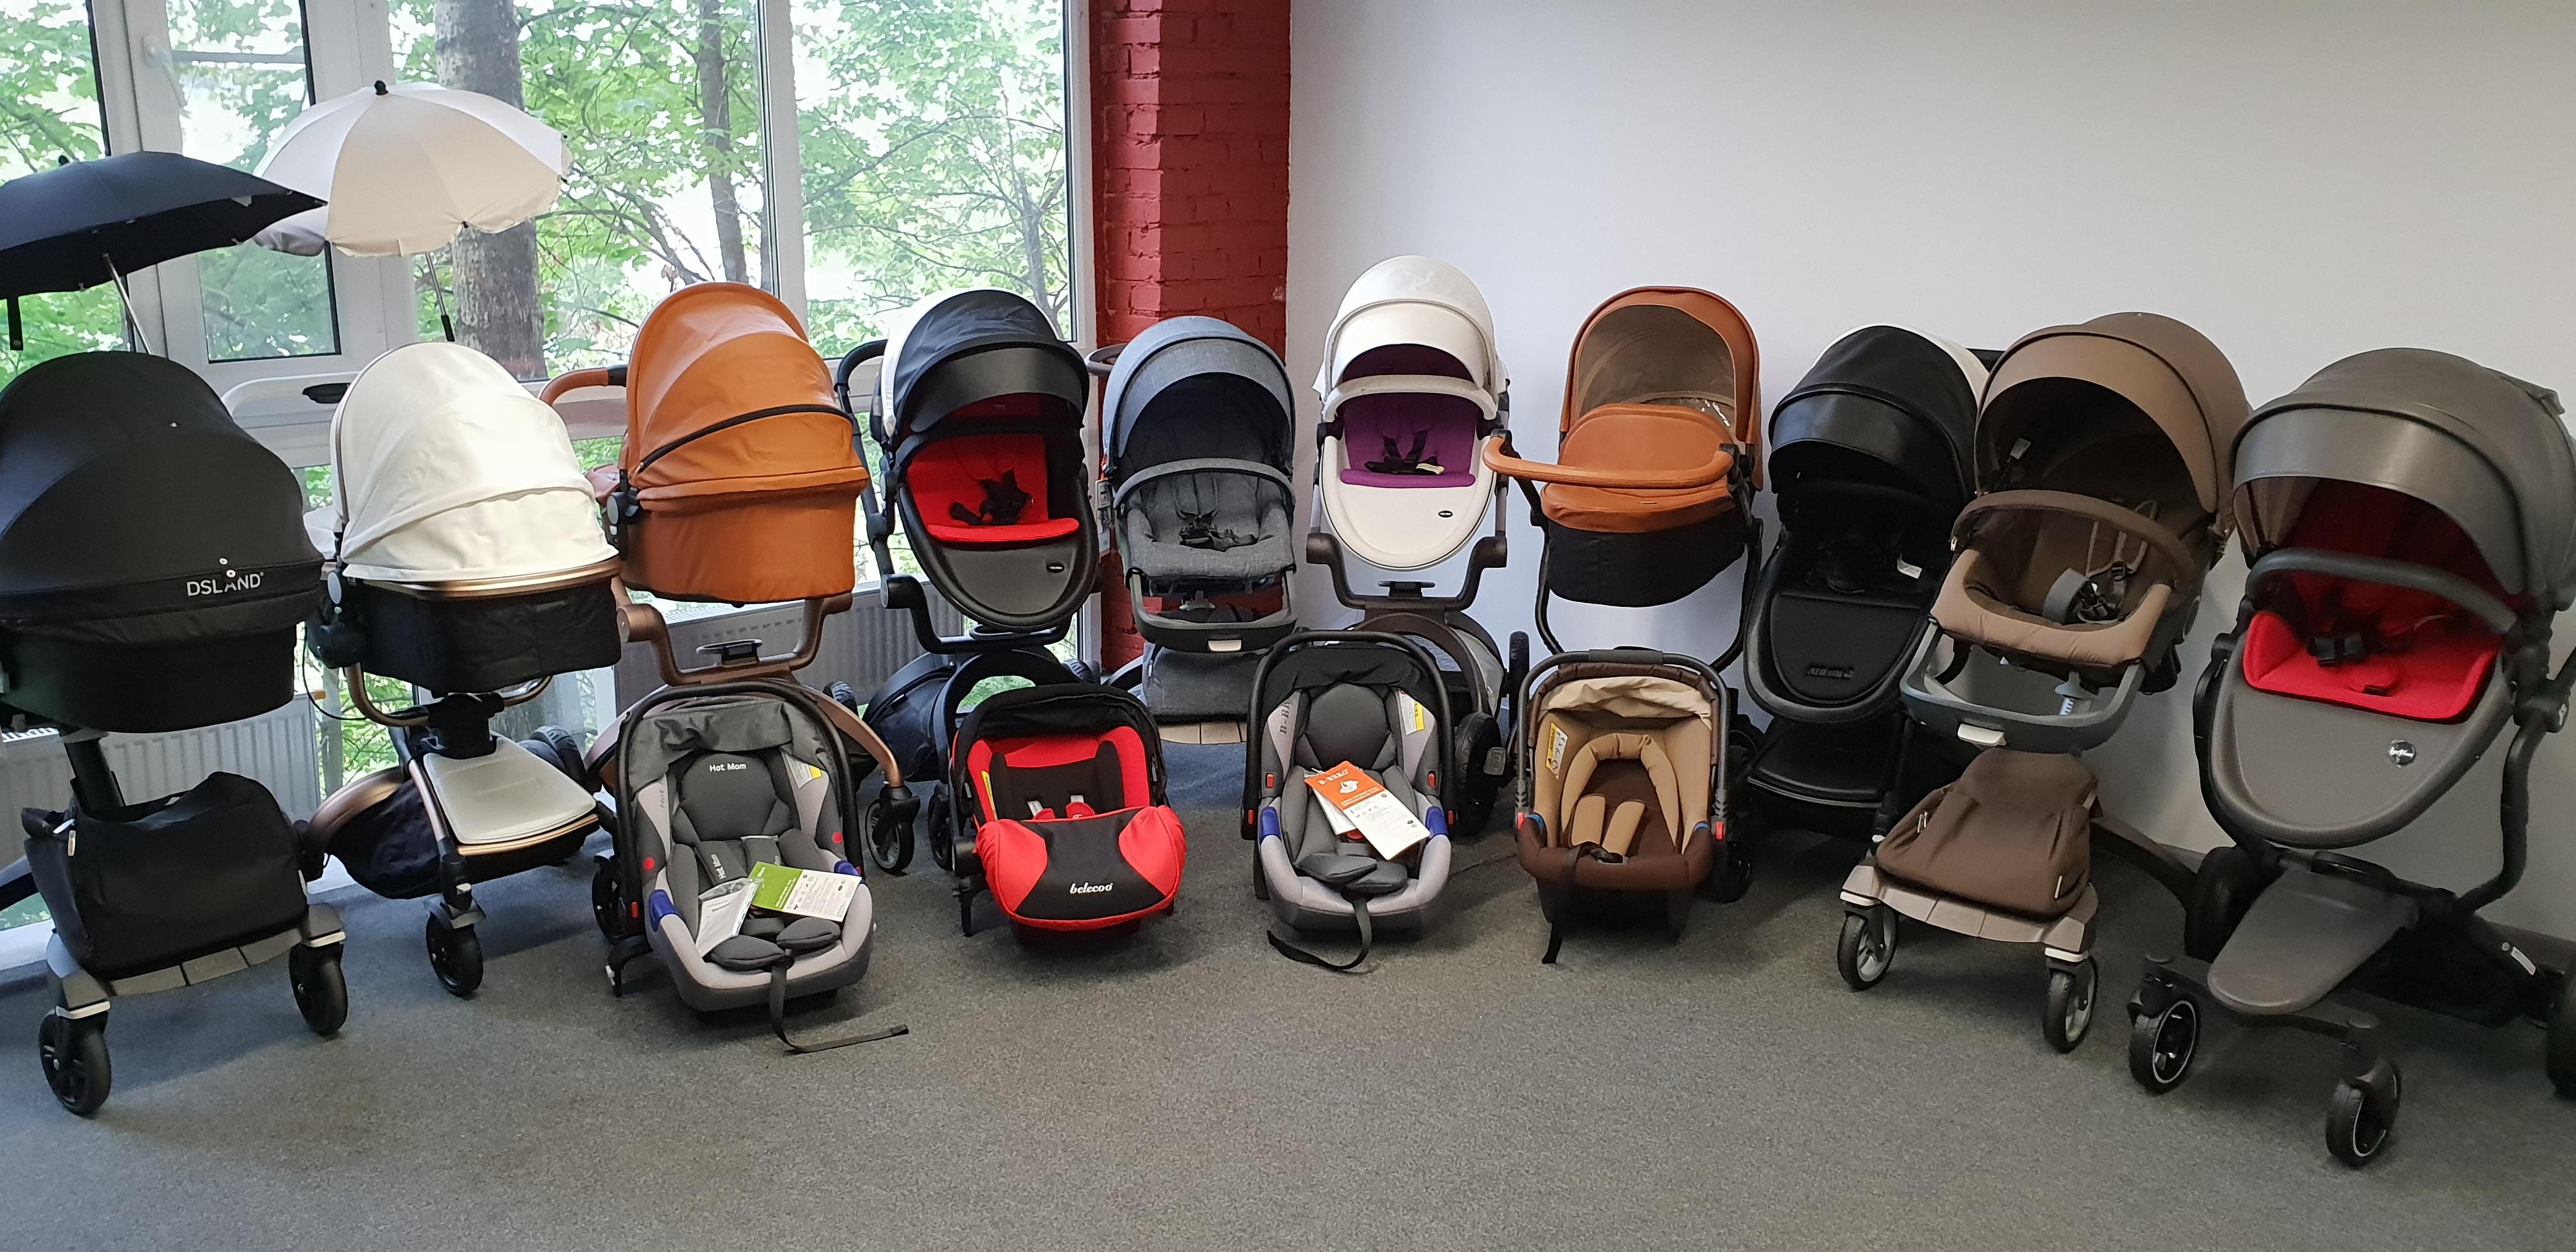 Детские коляски 2 и 3 в 1: Hot mom, FooFoo, Aulon, Dsland и др.